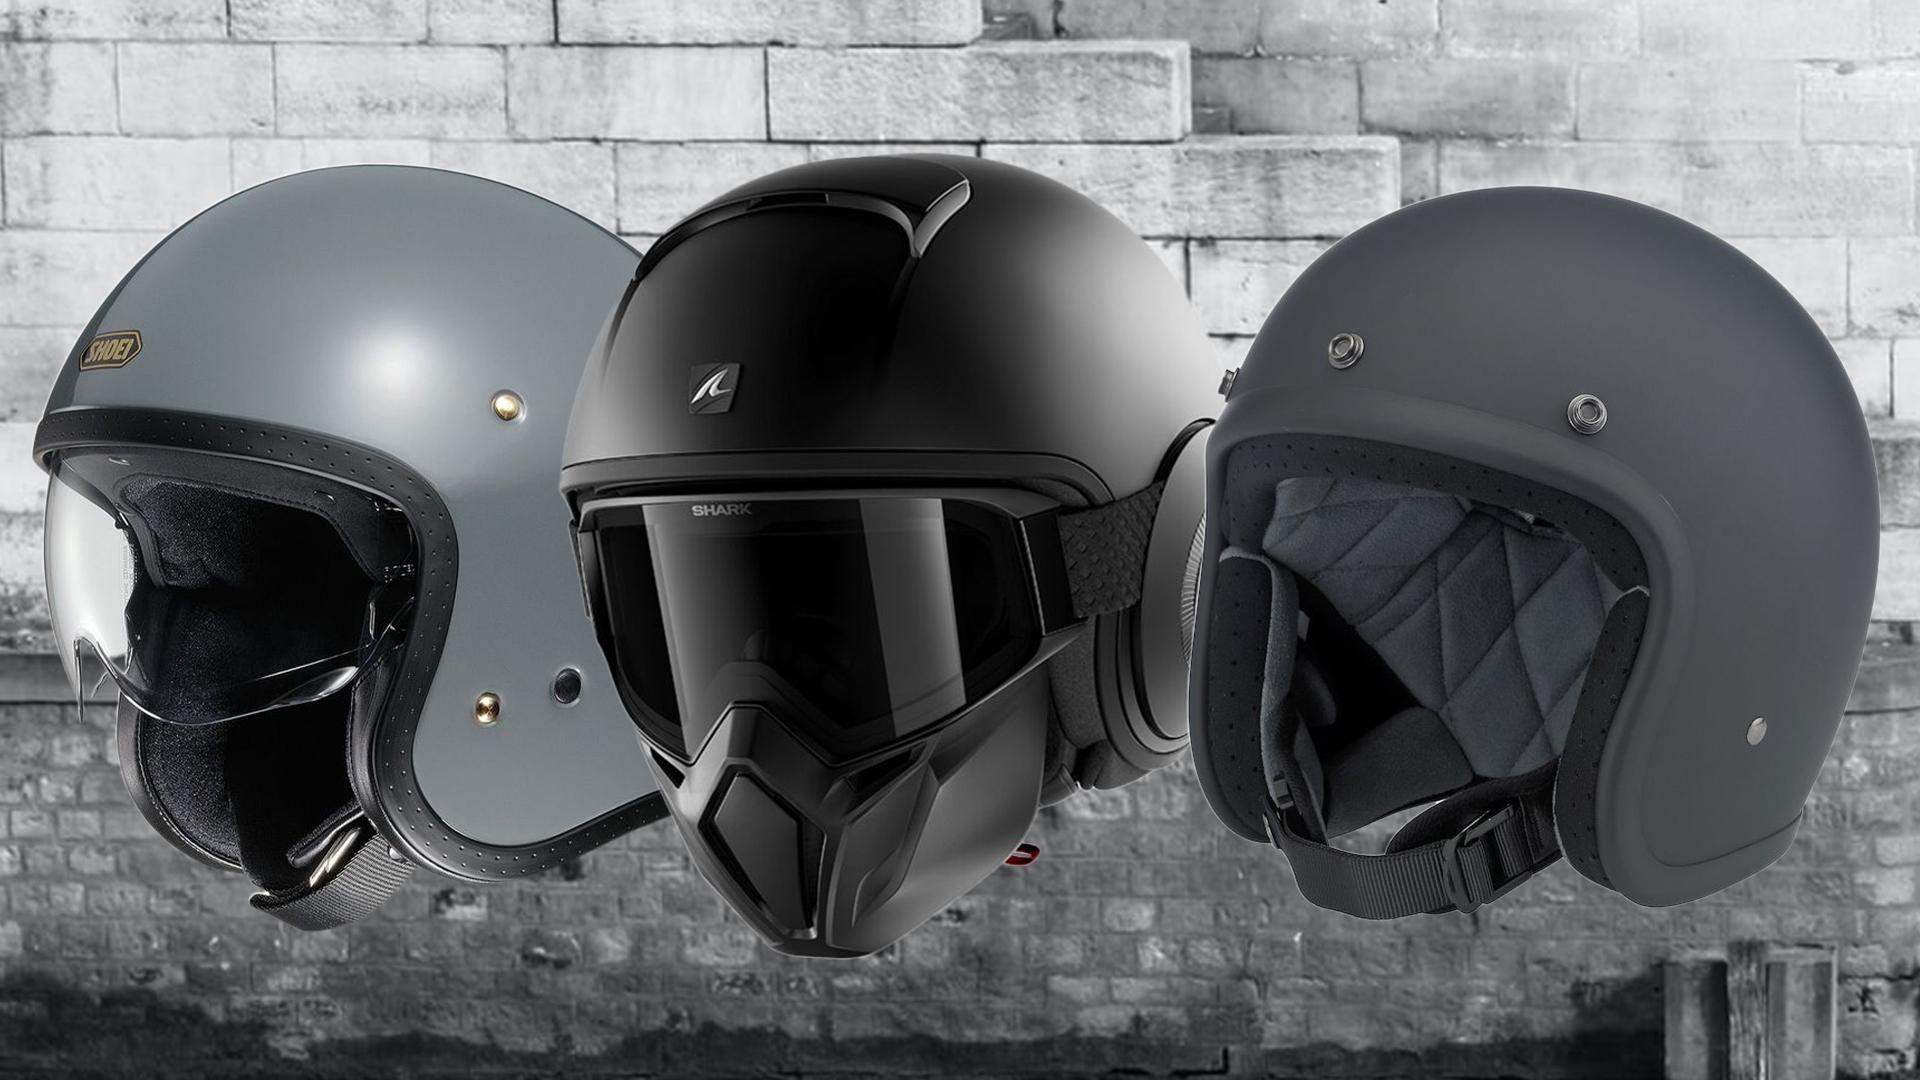 Best Open Face Helmets Under 500 for Beginners